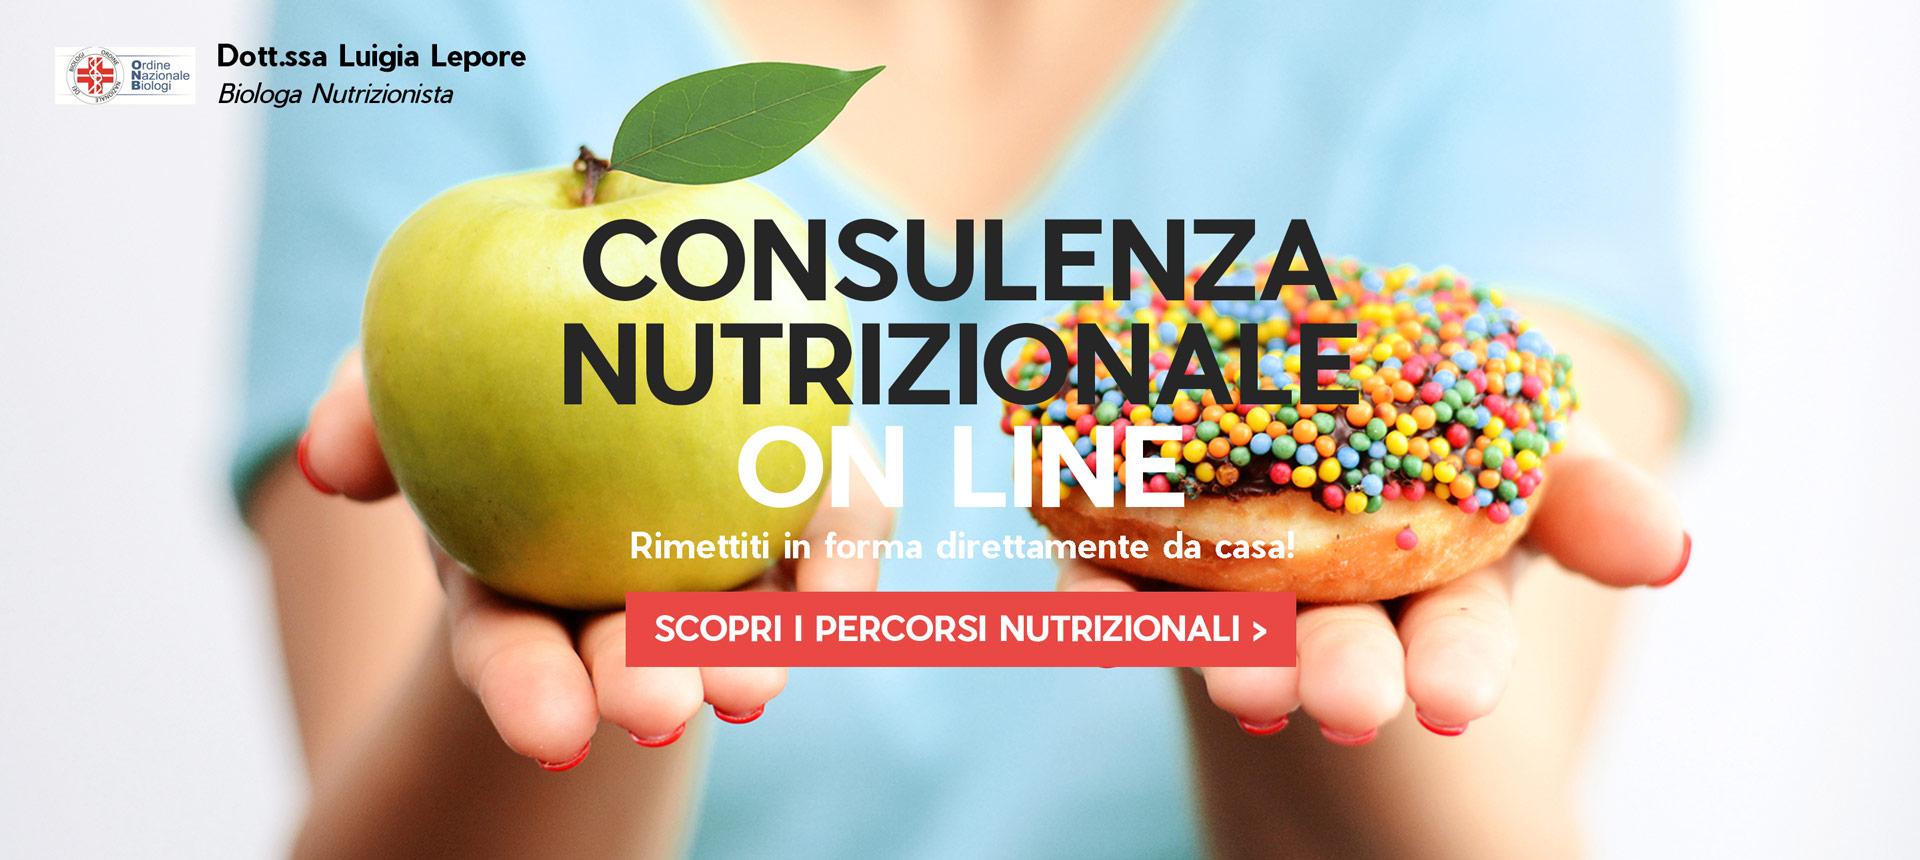 Consulenza-Nutrizionale-On-Line